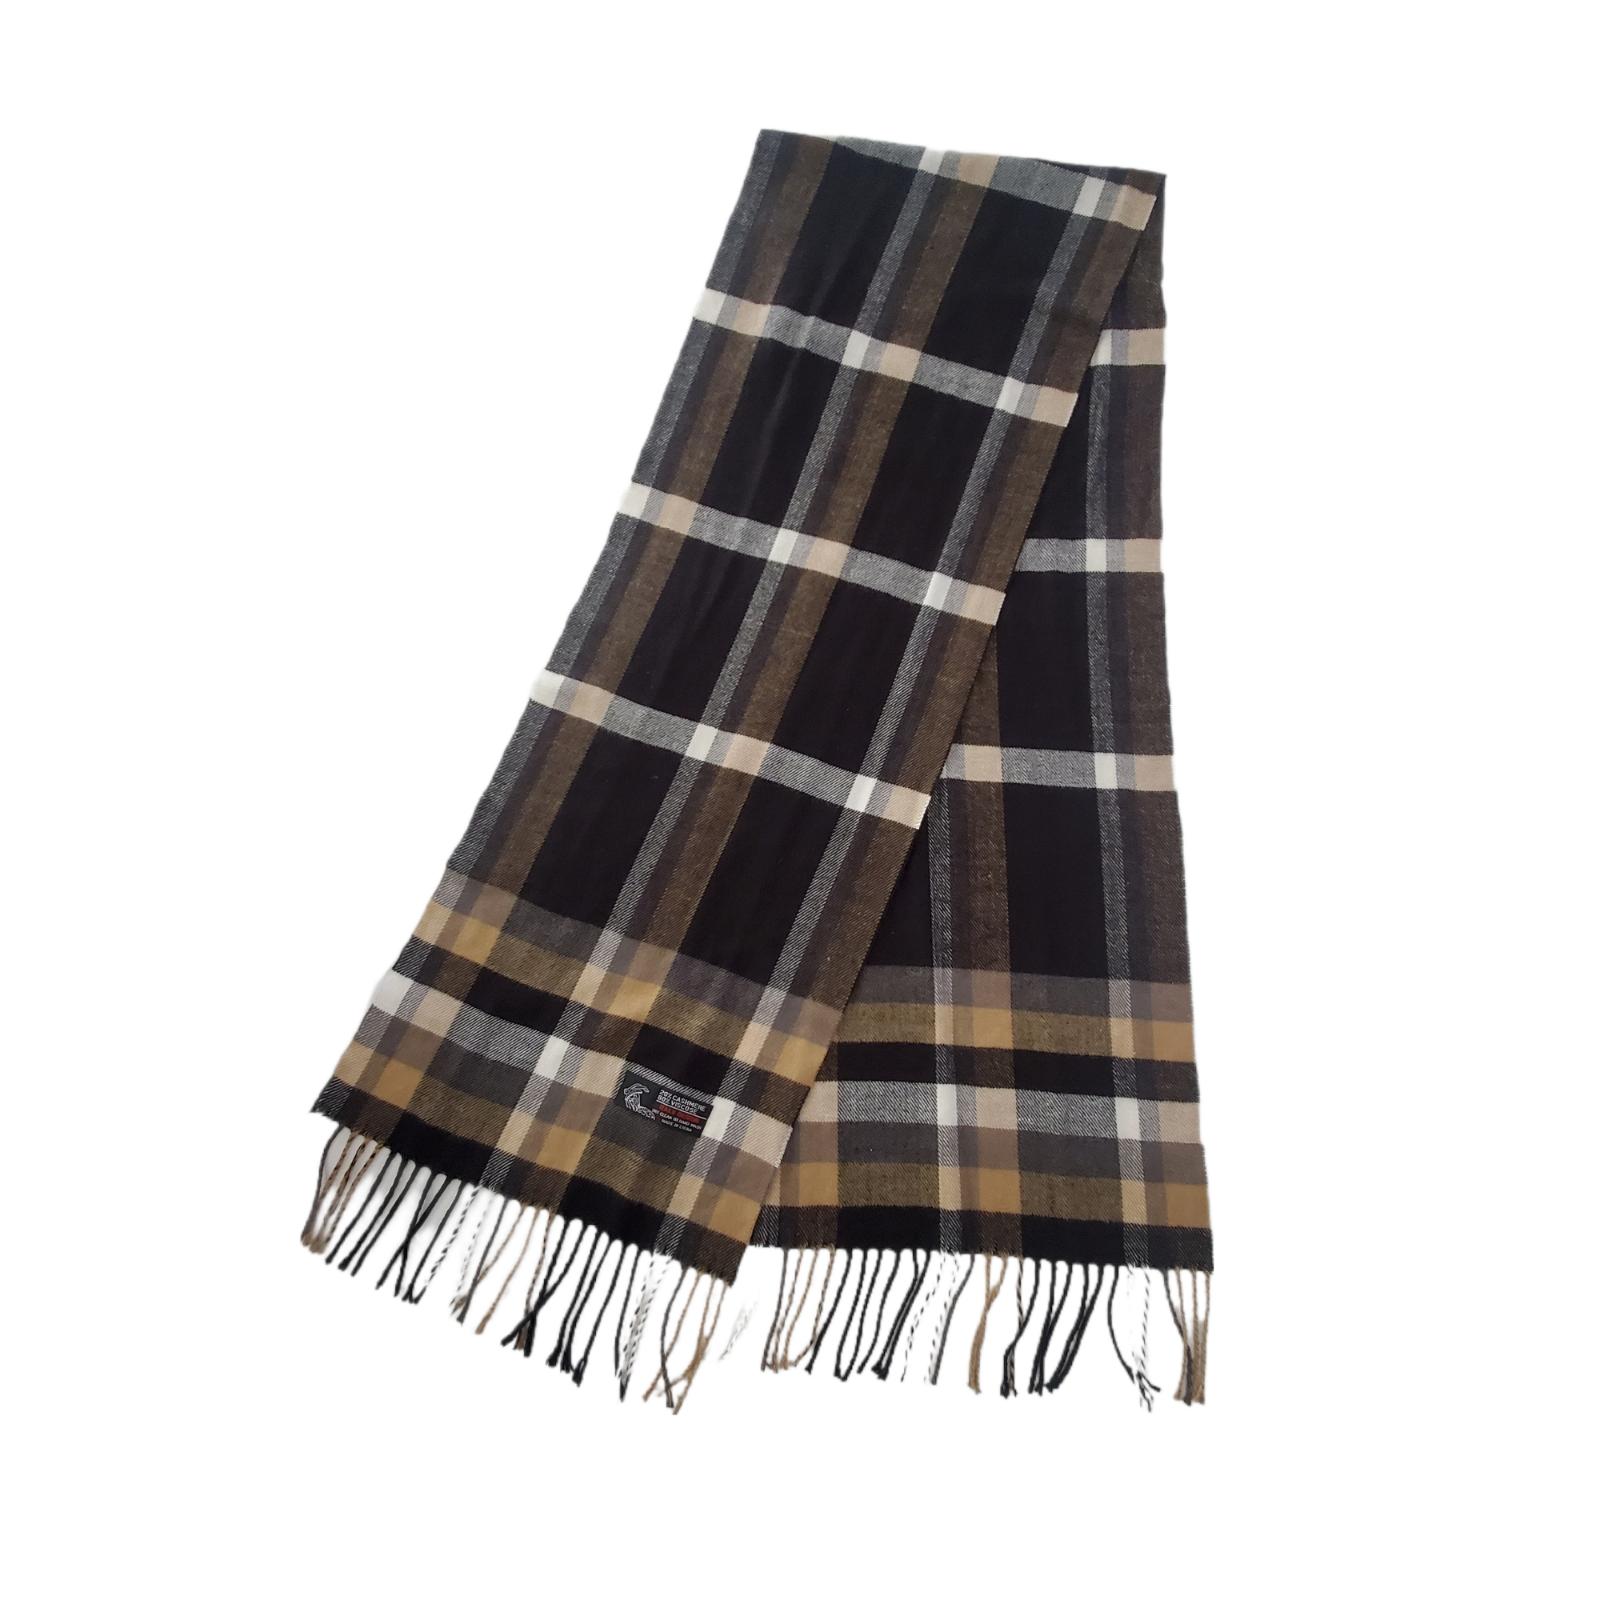 Italy Design Cashmere Viscose Blend Scarf Brown Black White Plaid w/Fringe